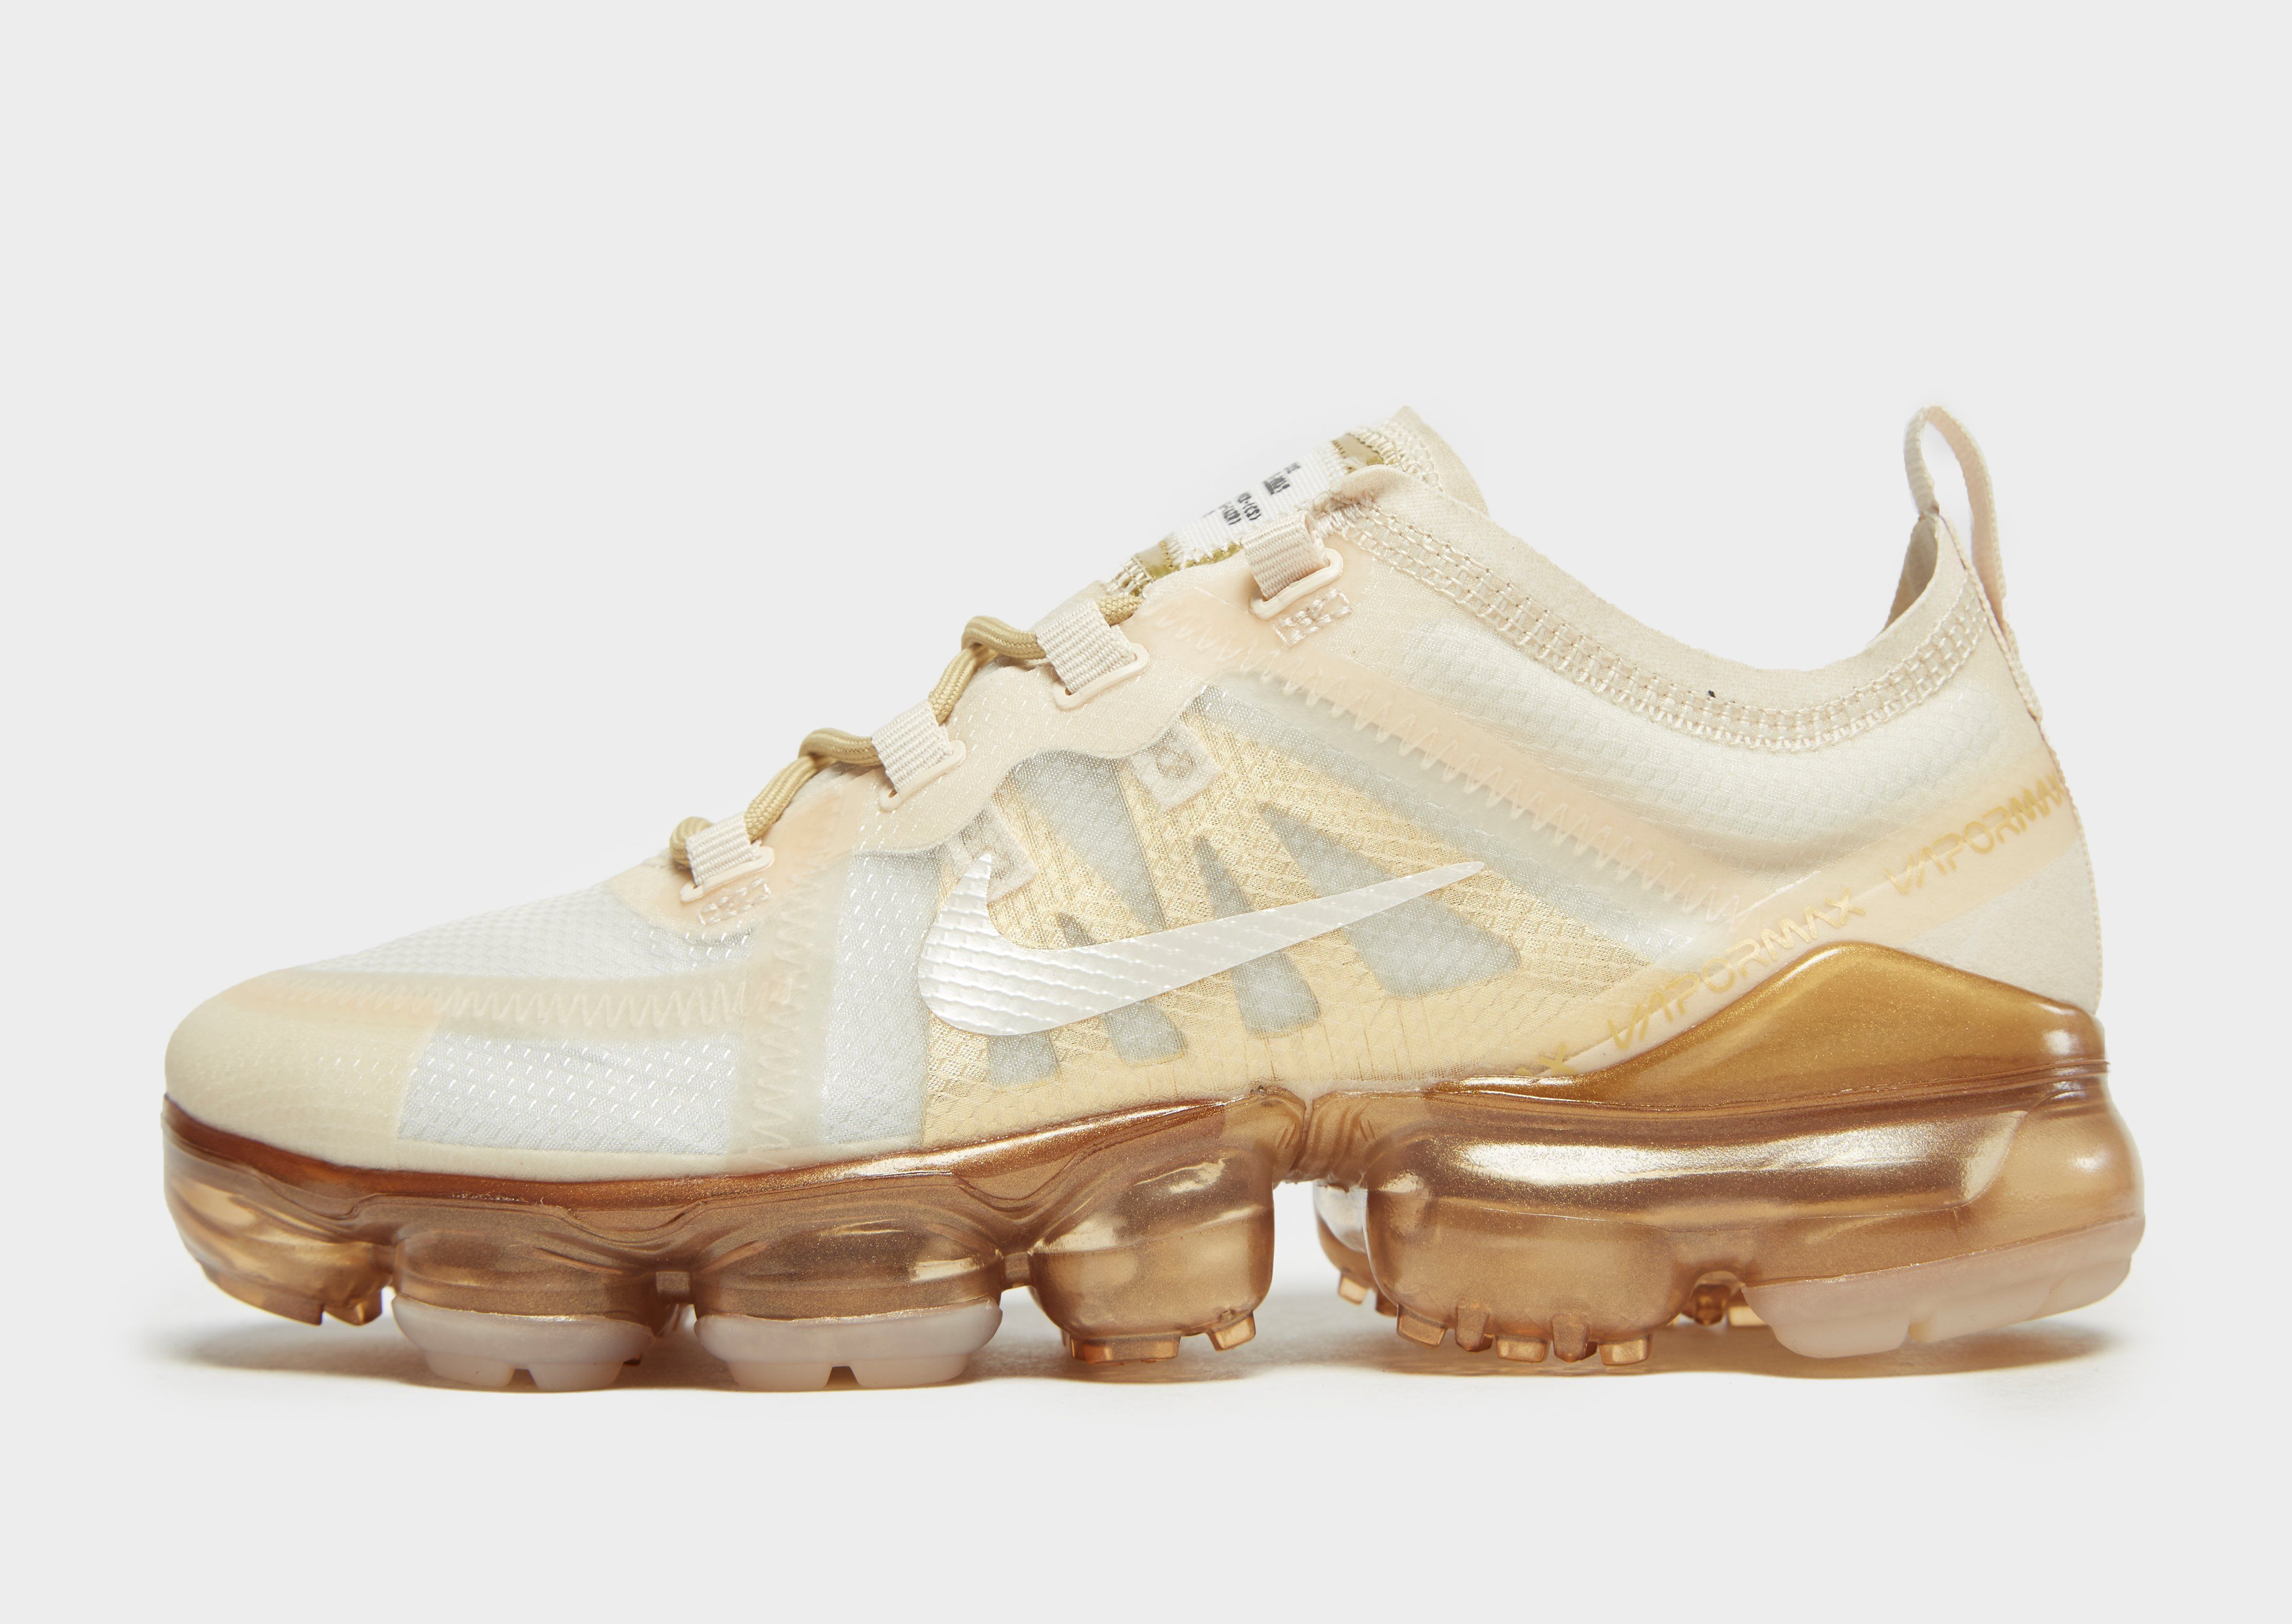 bc7c8b0d5c9d NIKE Nike Air VaporMax 2019 Women s Shoe